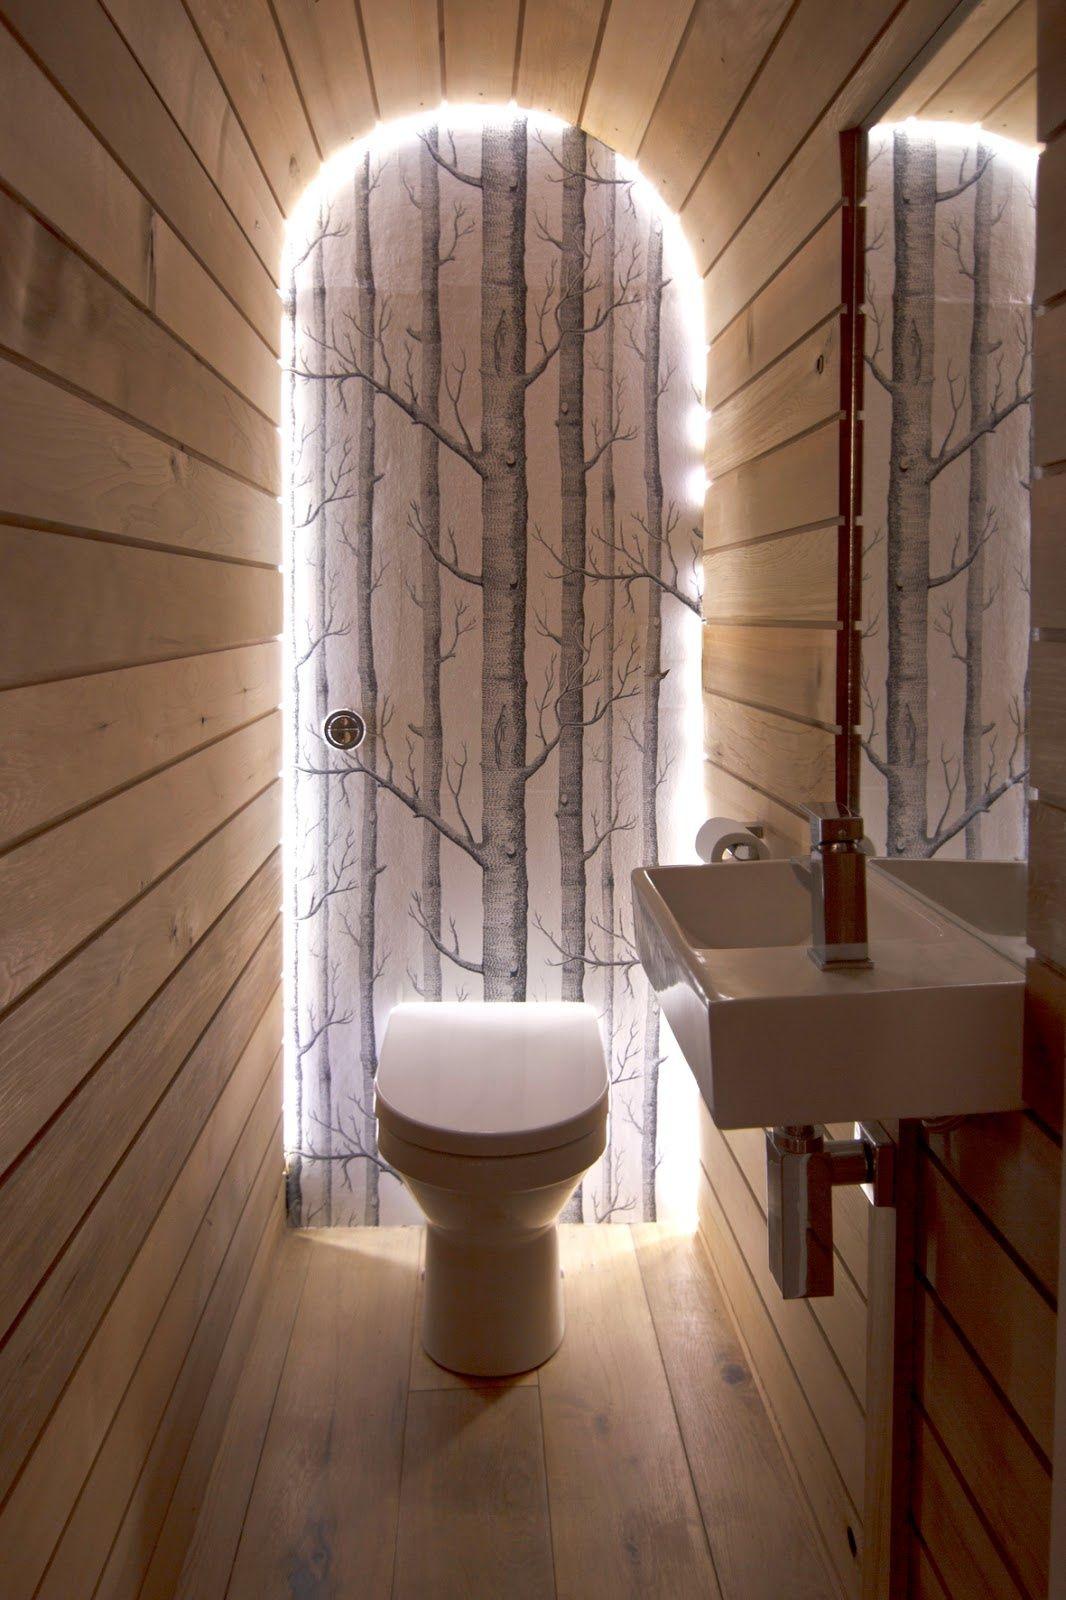 Pin by Jamie Monroe on Light Stuffs | Pinterest | Washroom, Toilet ...